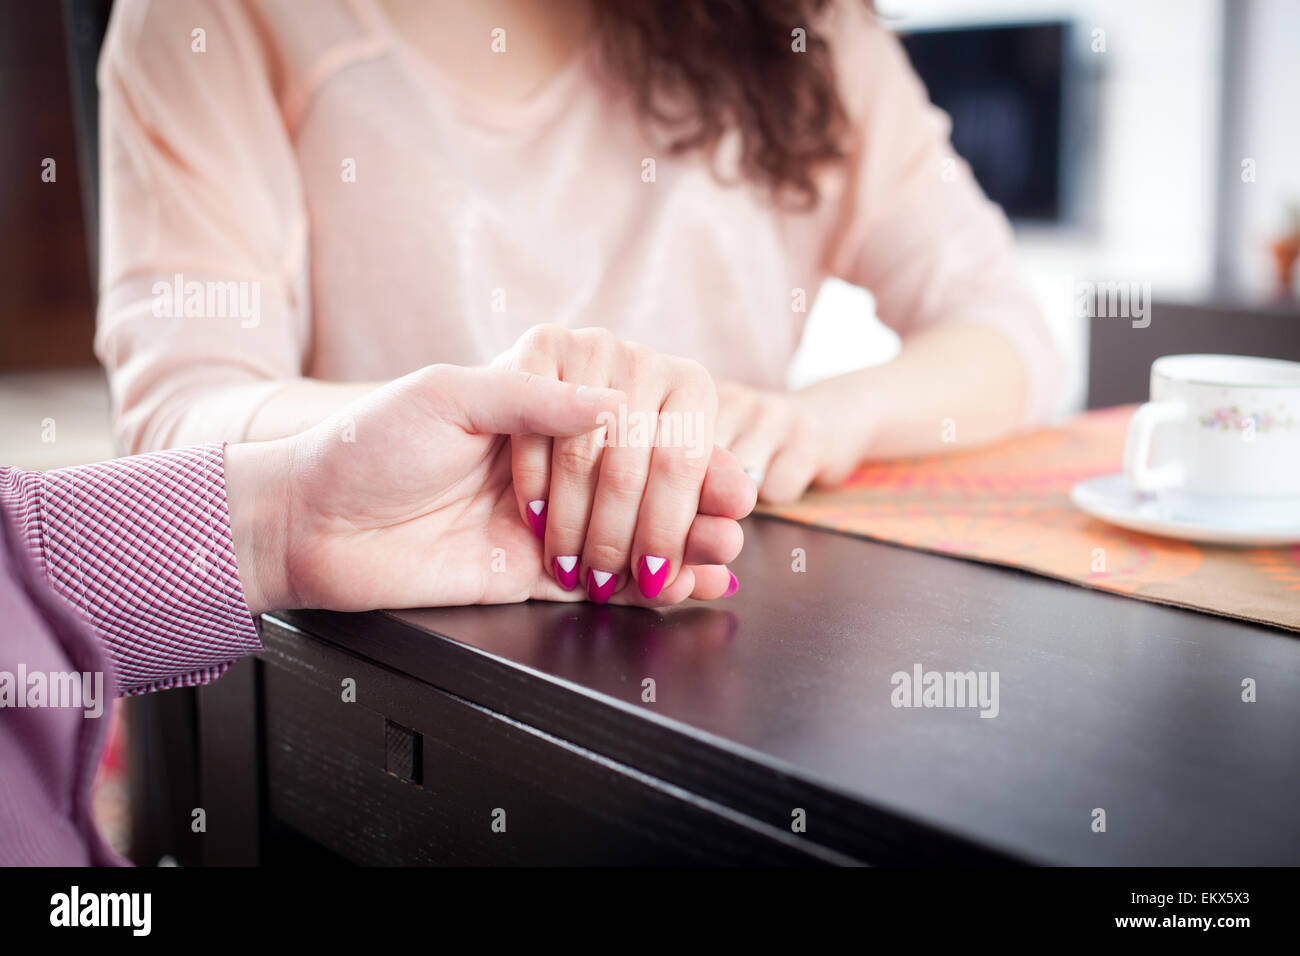 Engaged Couple Holding Hands Restaurant Stock Photos & Engaged ...